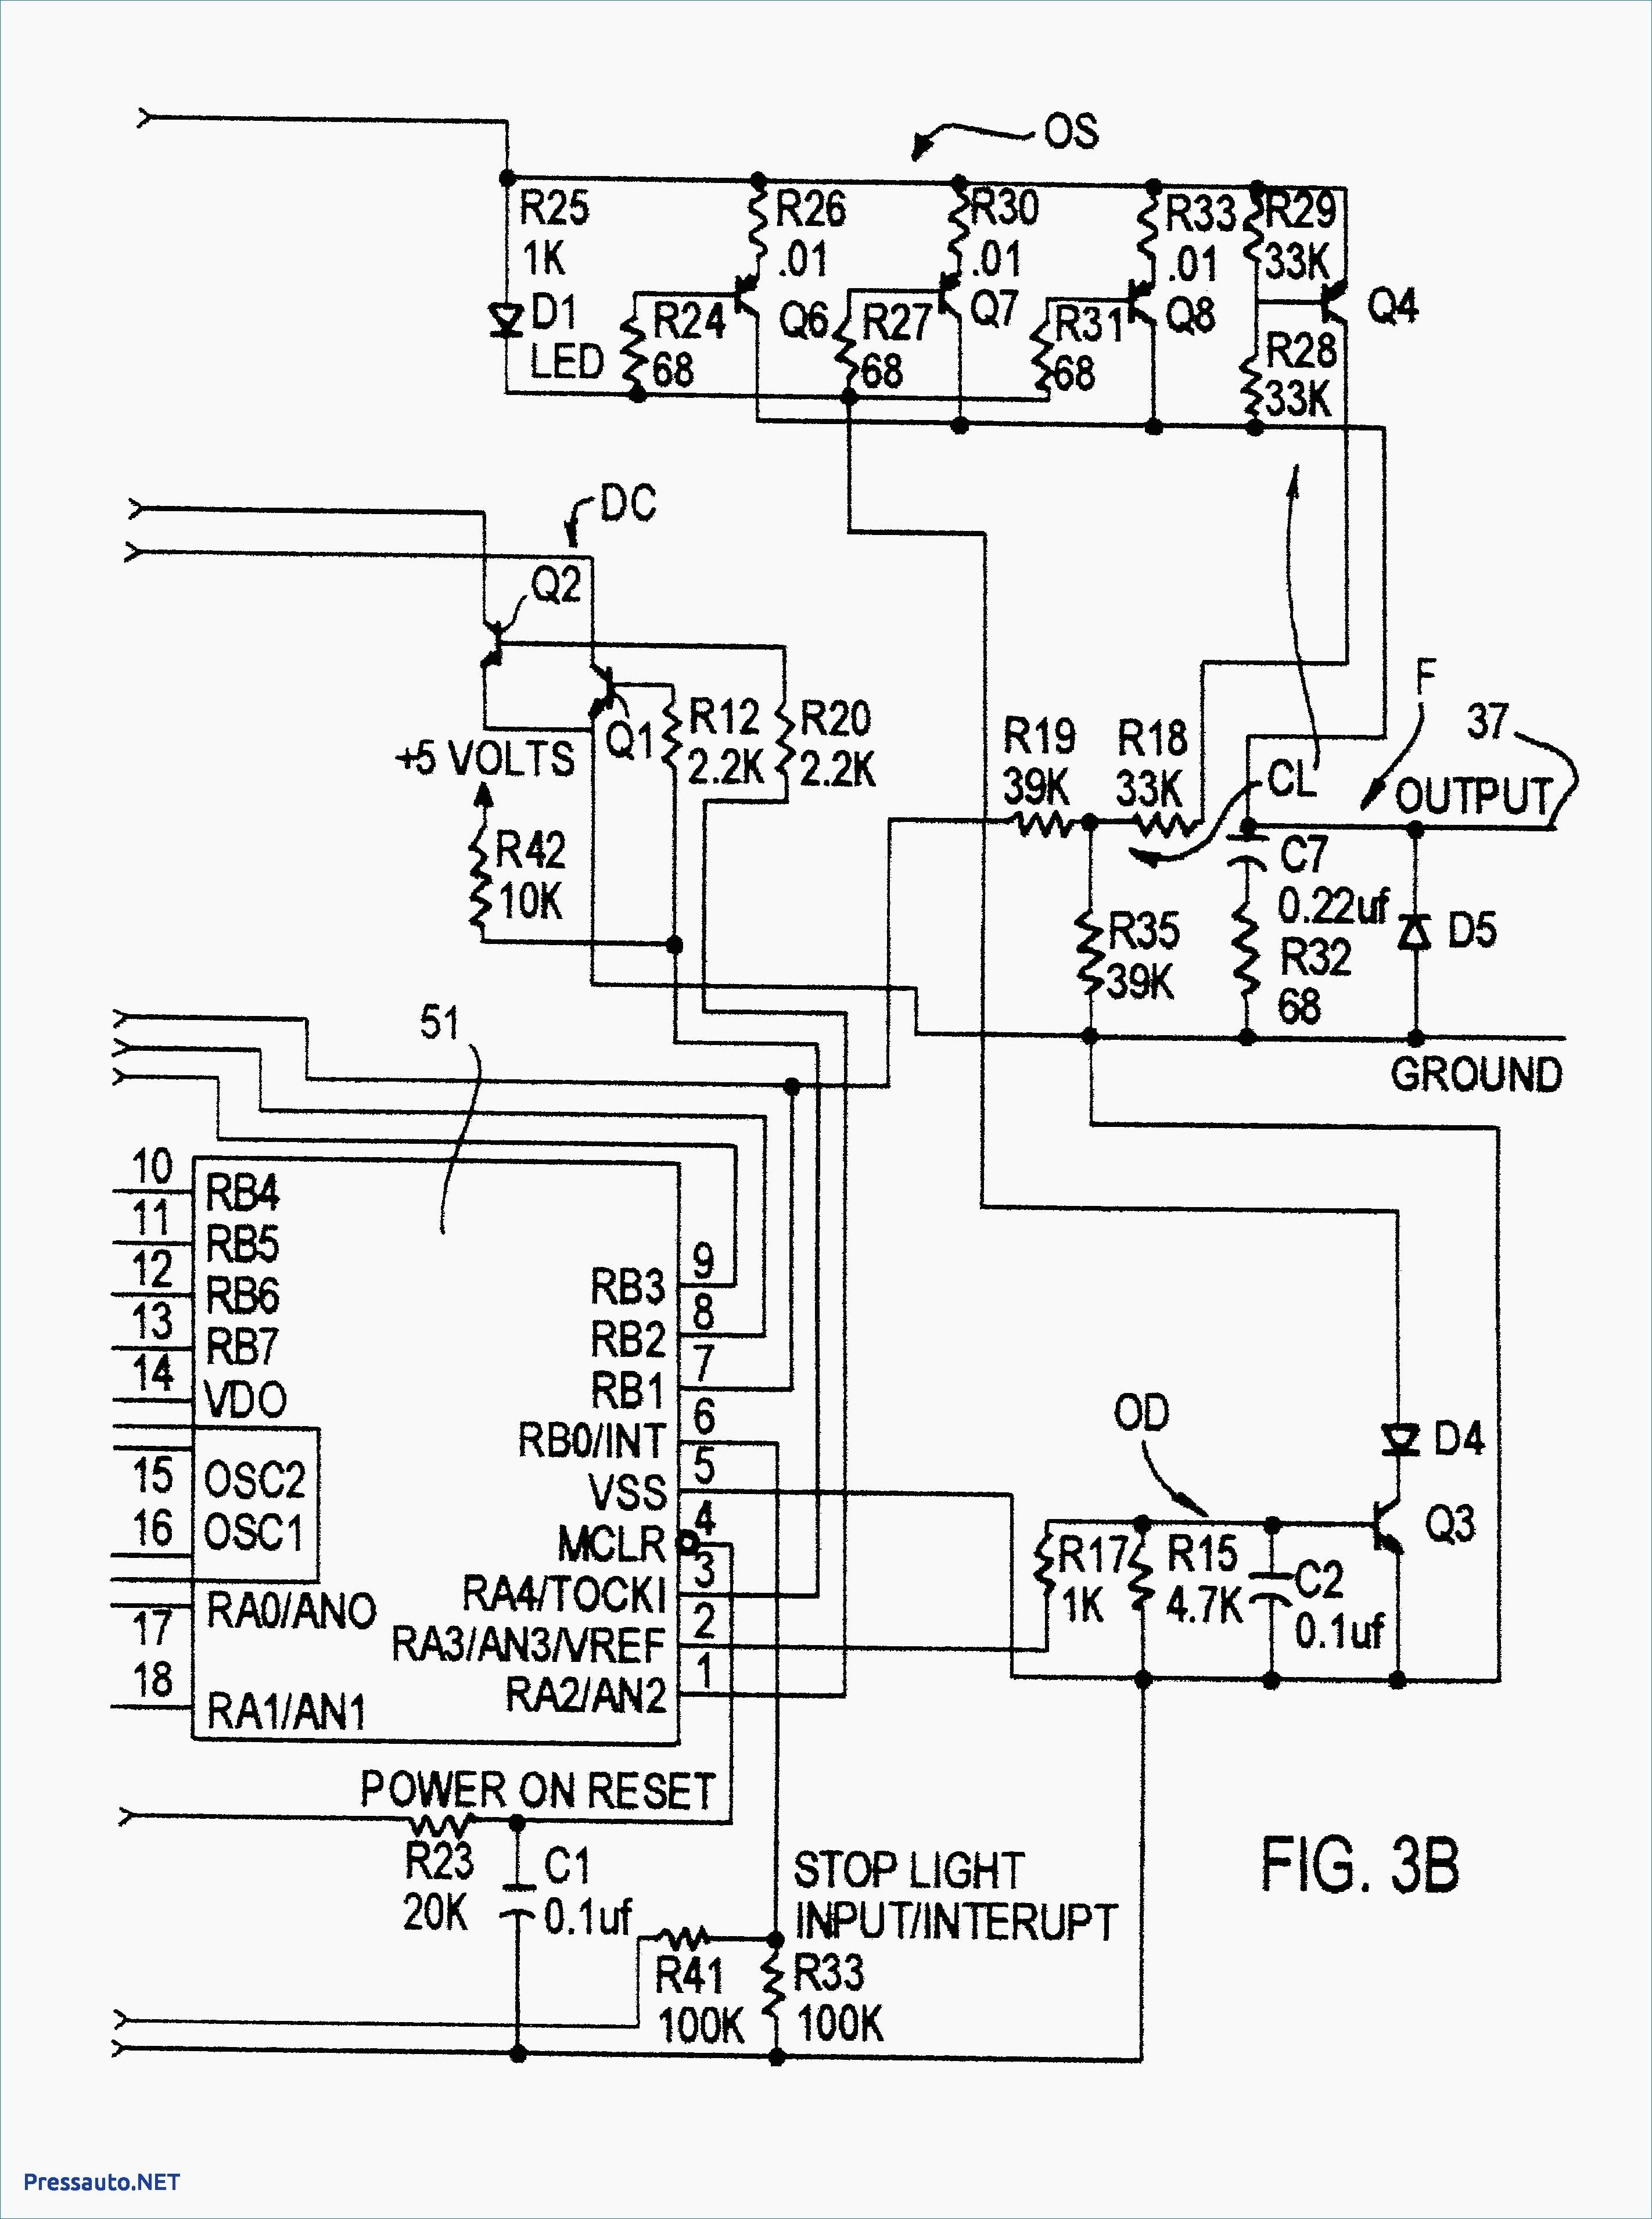 Car Trailer Wiring Diagram Utility Trailer Wiring Diagram originalstylophone Of Car Trailer Wiring Diagram